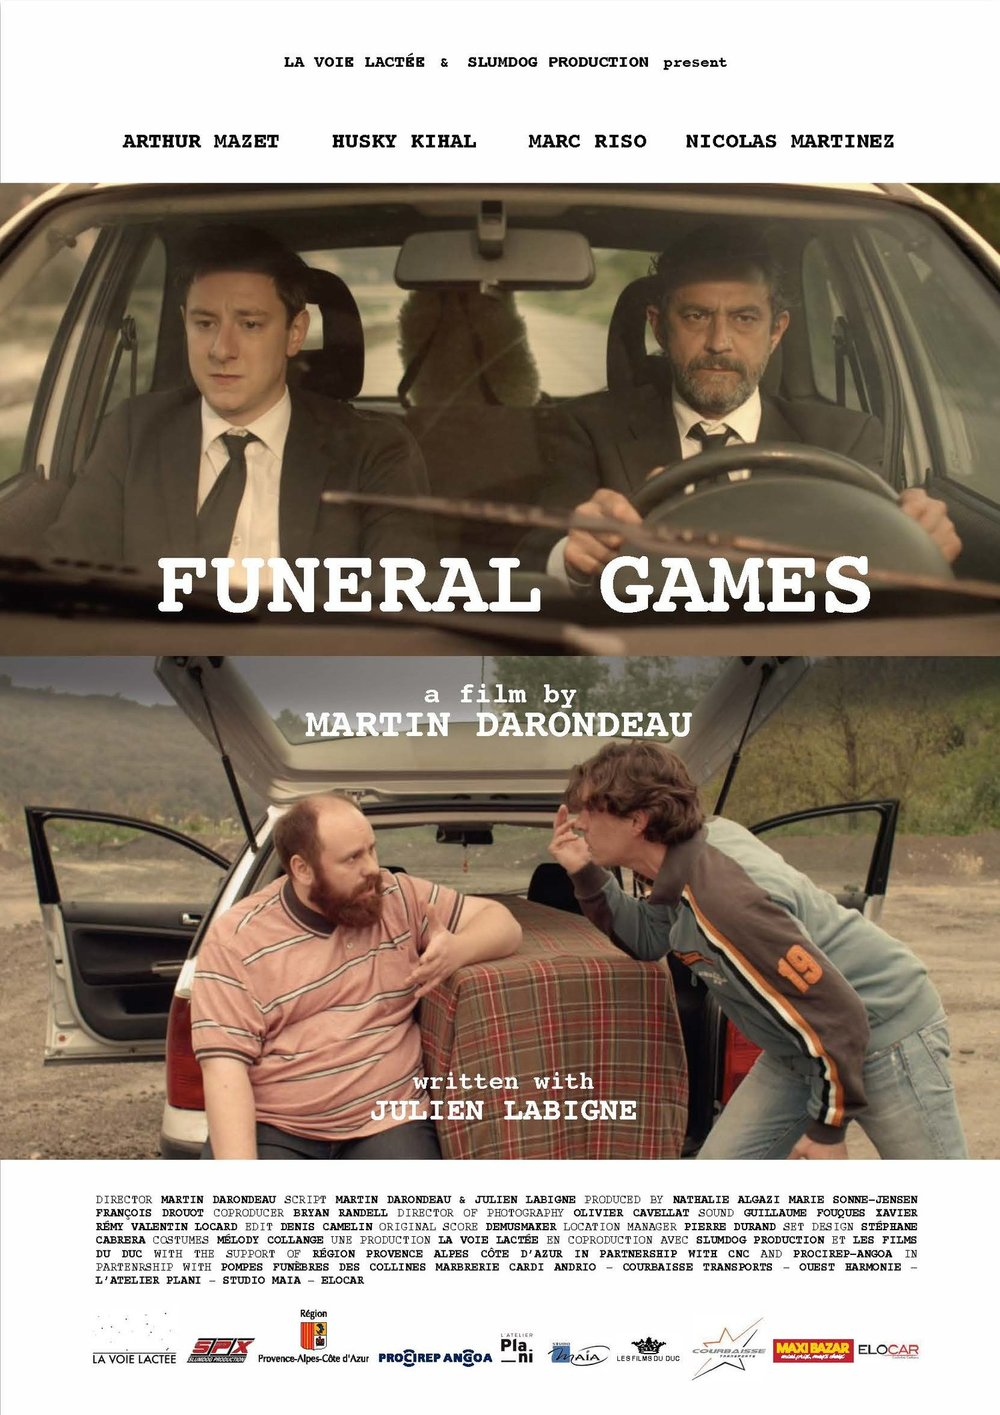 Funeral Games - Filmmaker: Martin Darondeau